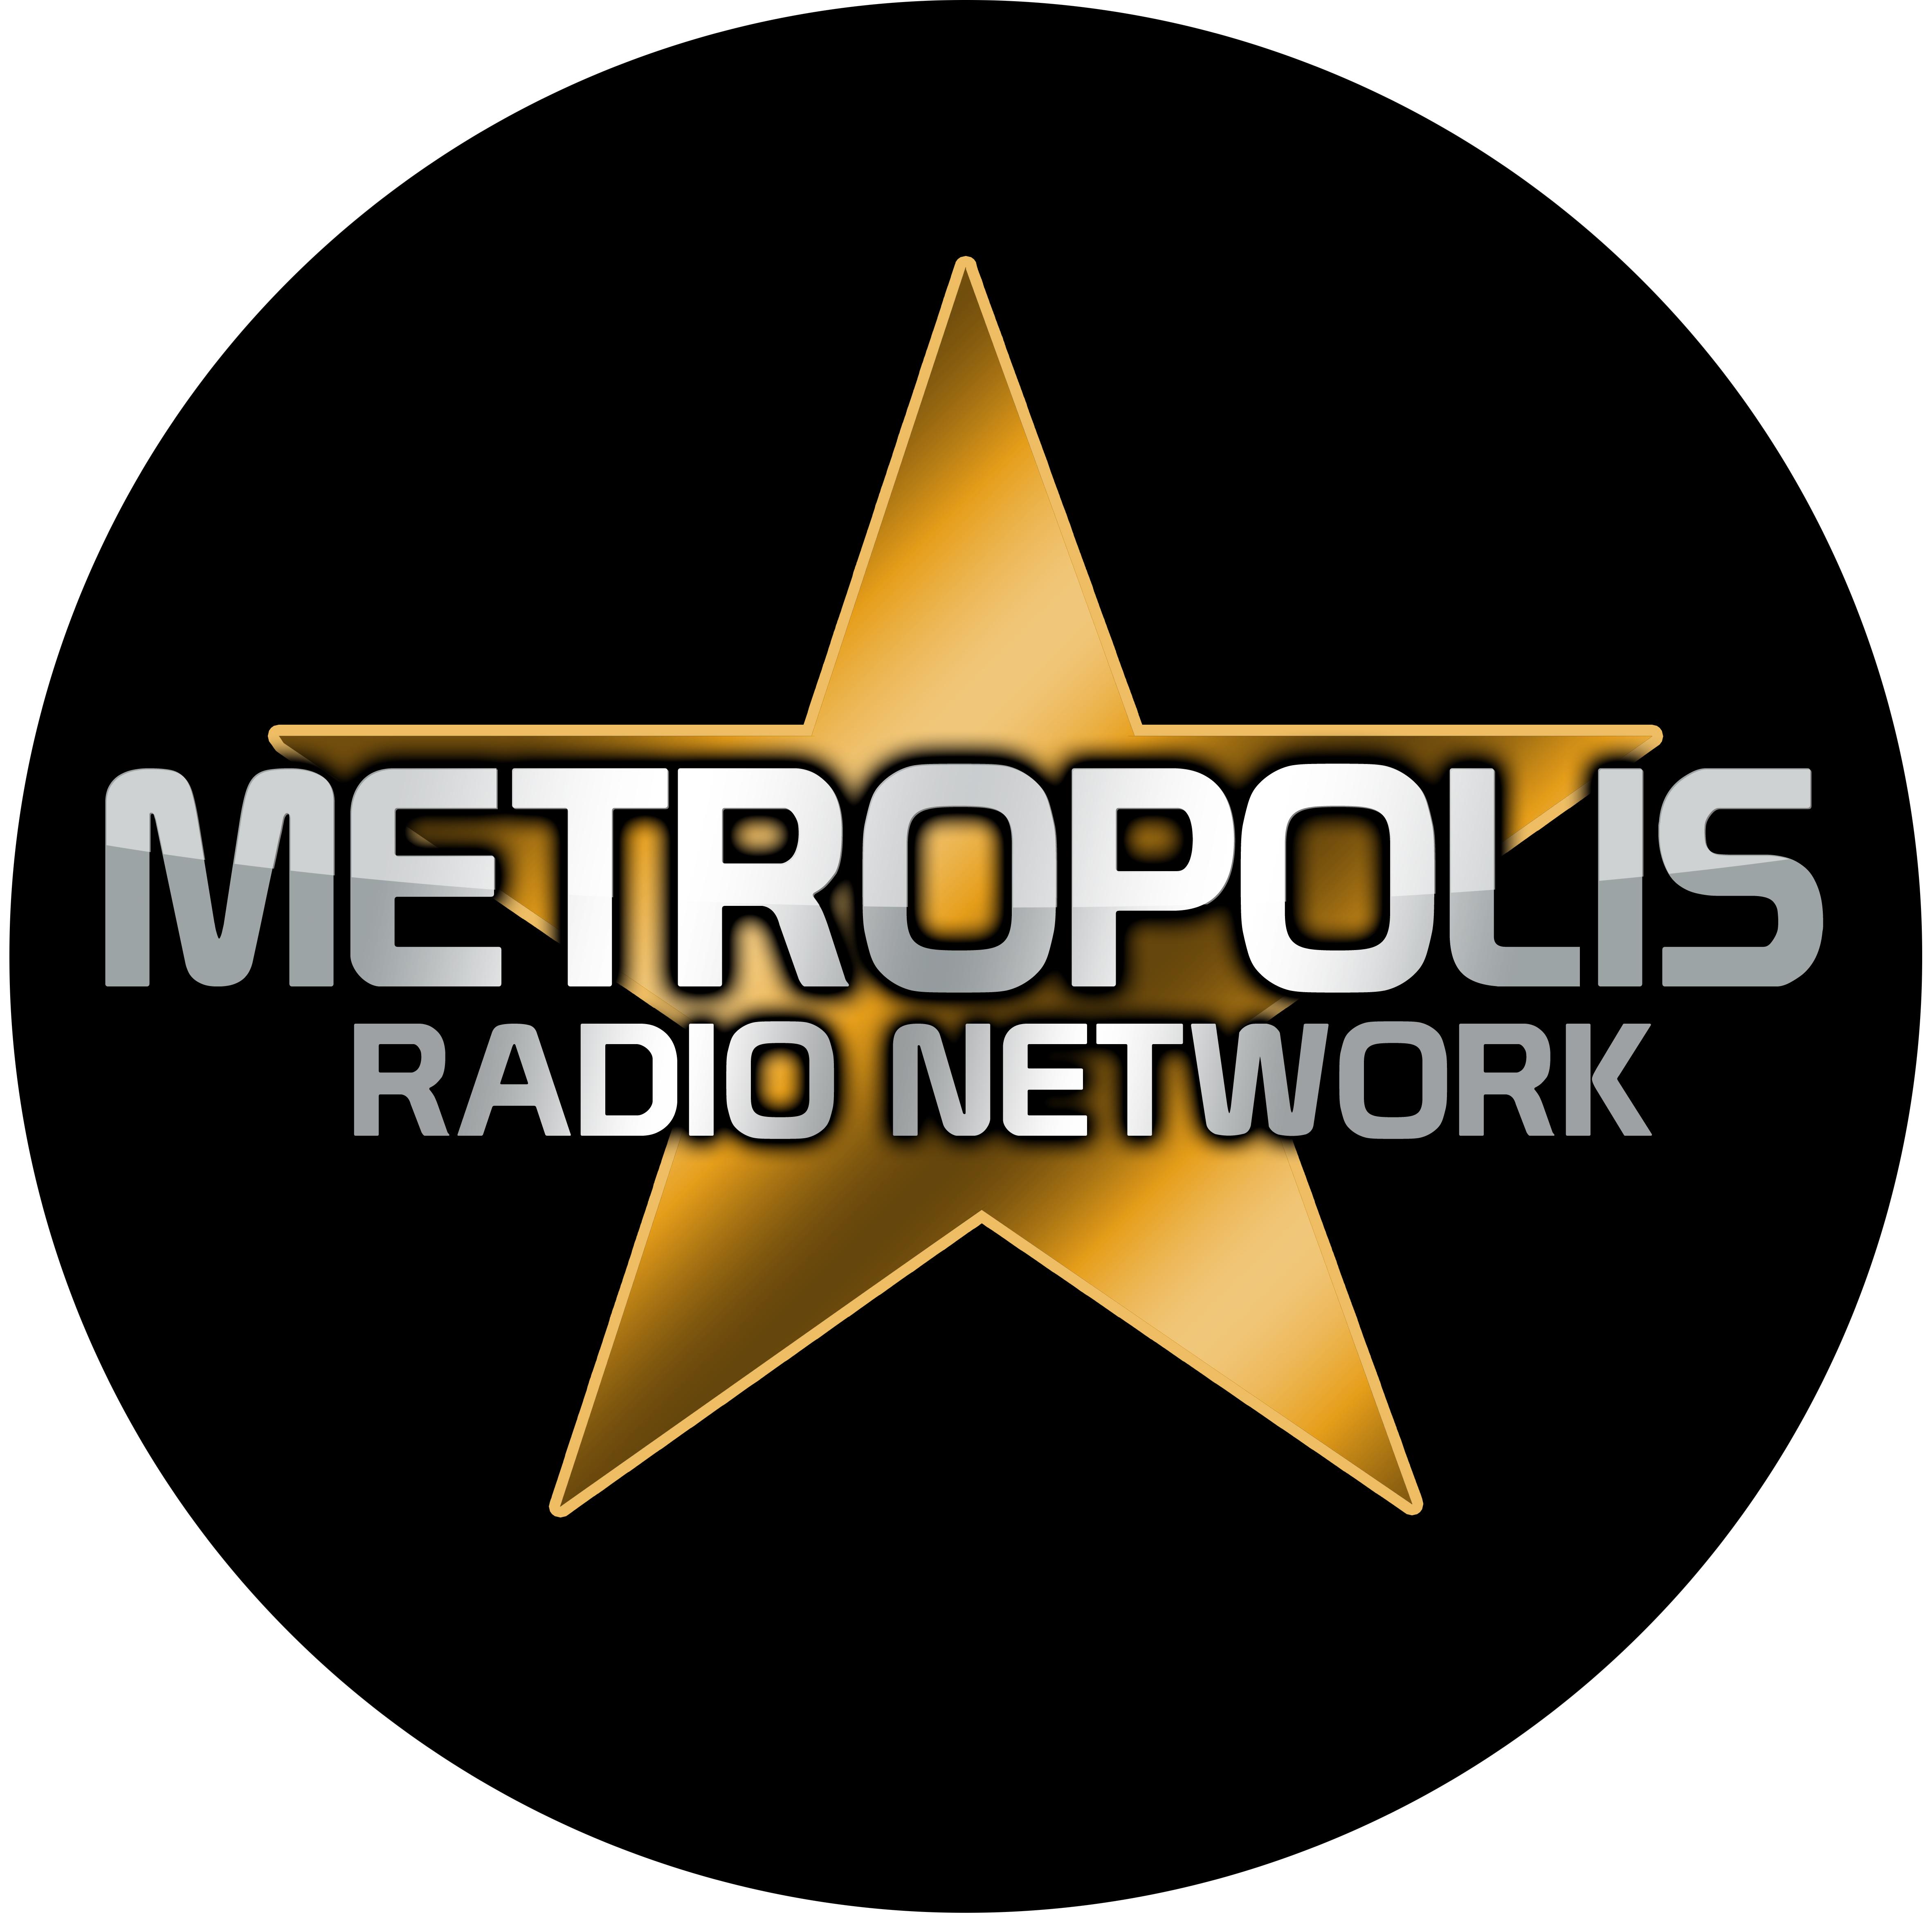 METROPOLIS RADIO